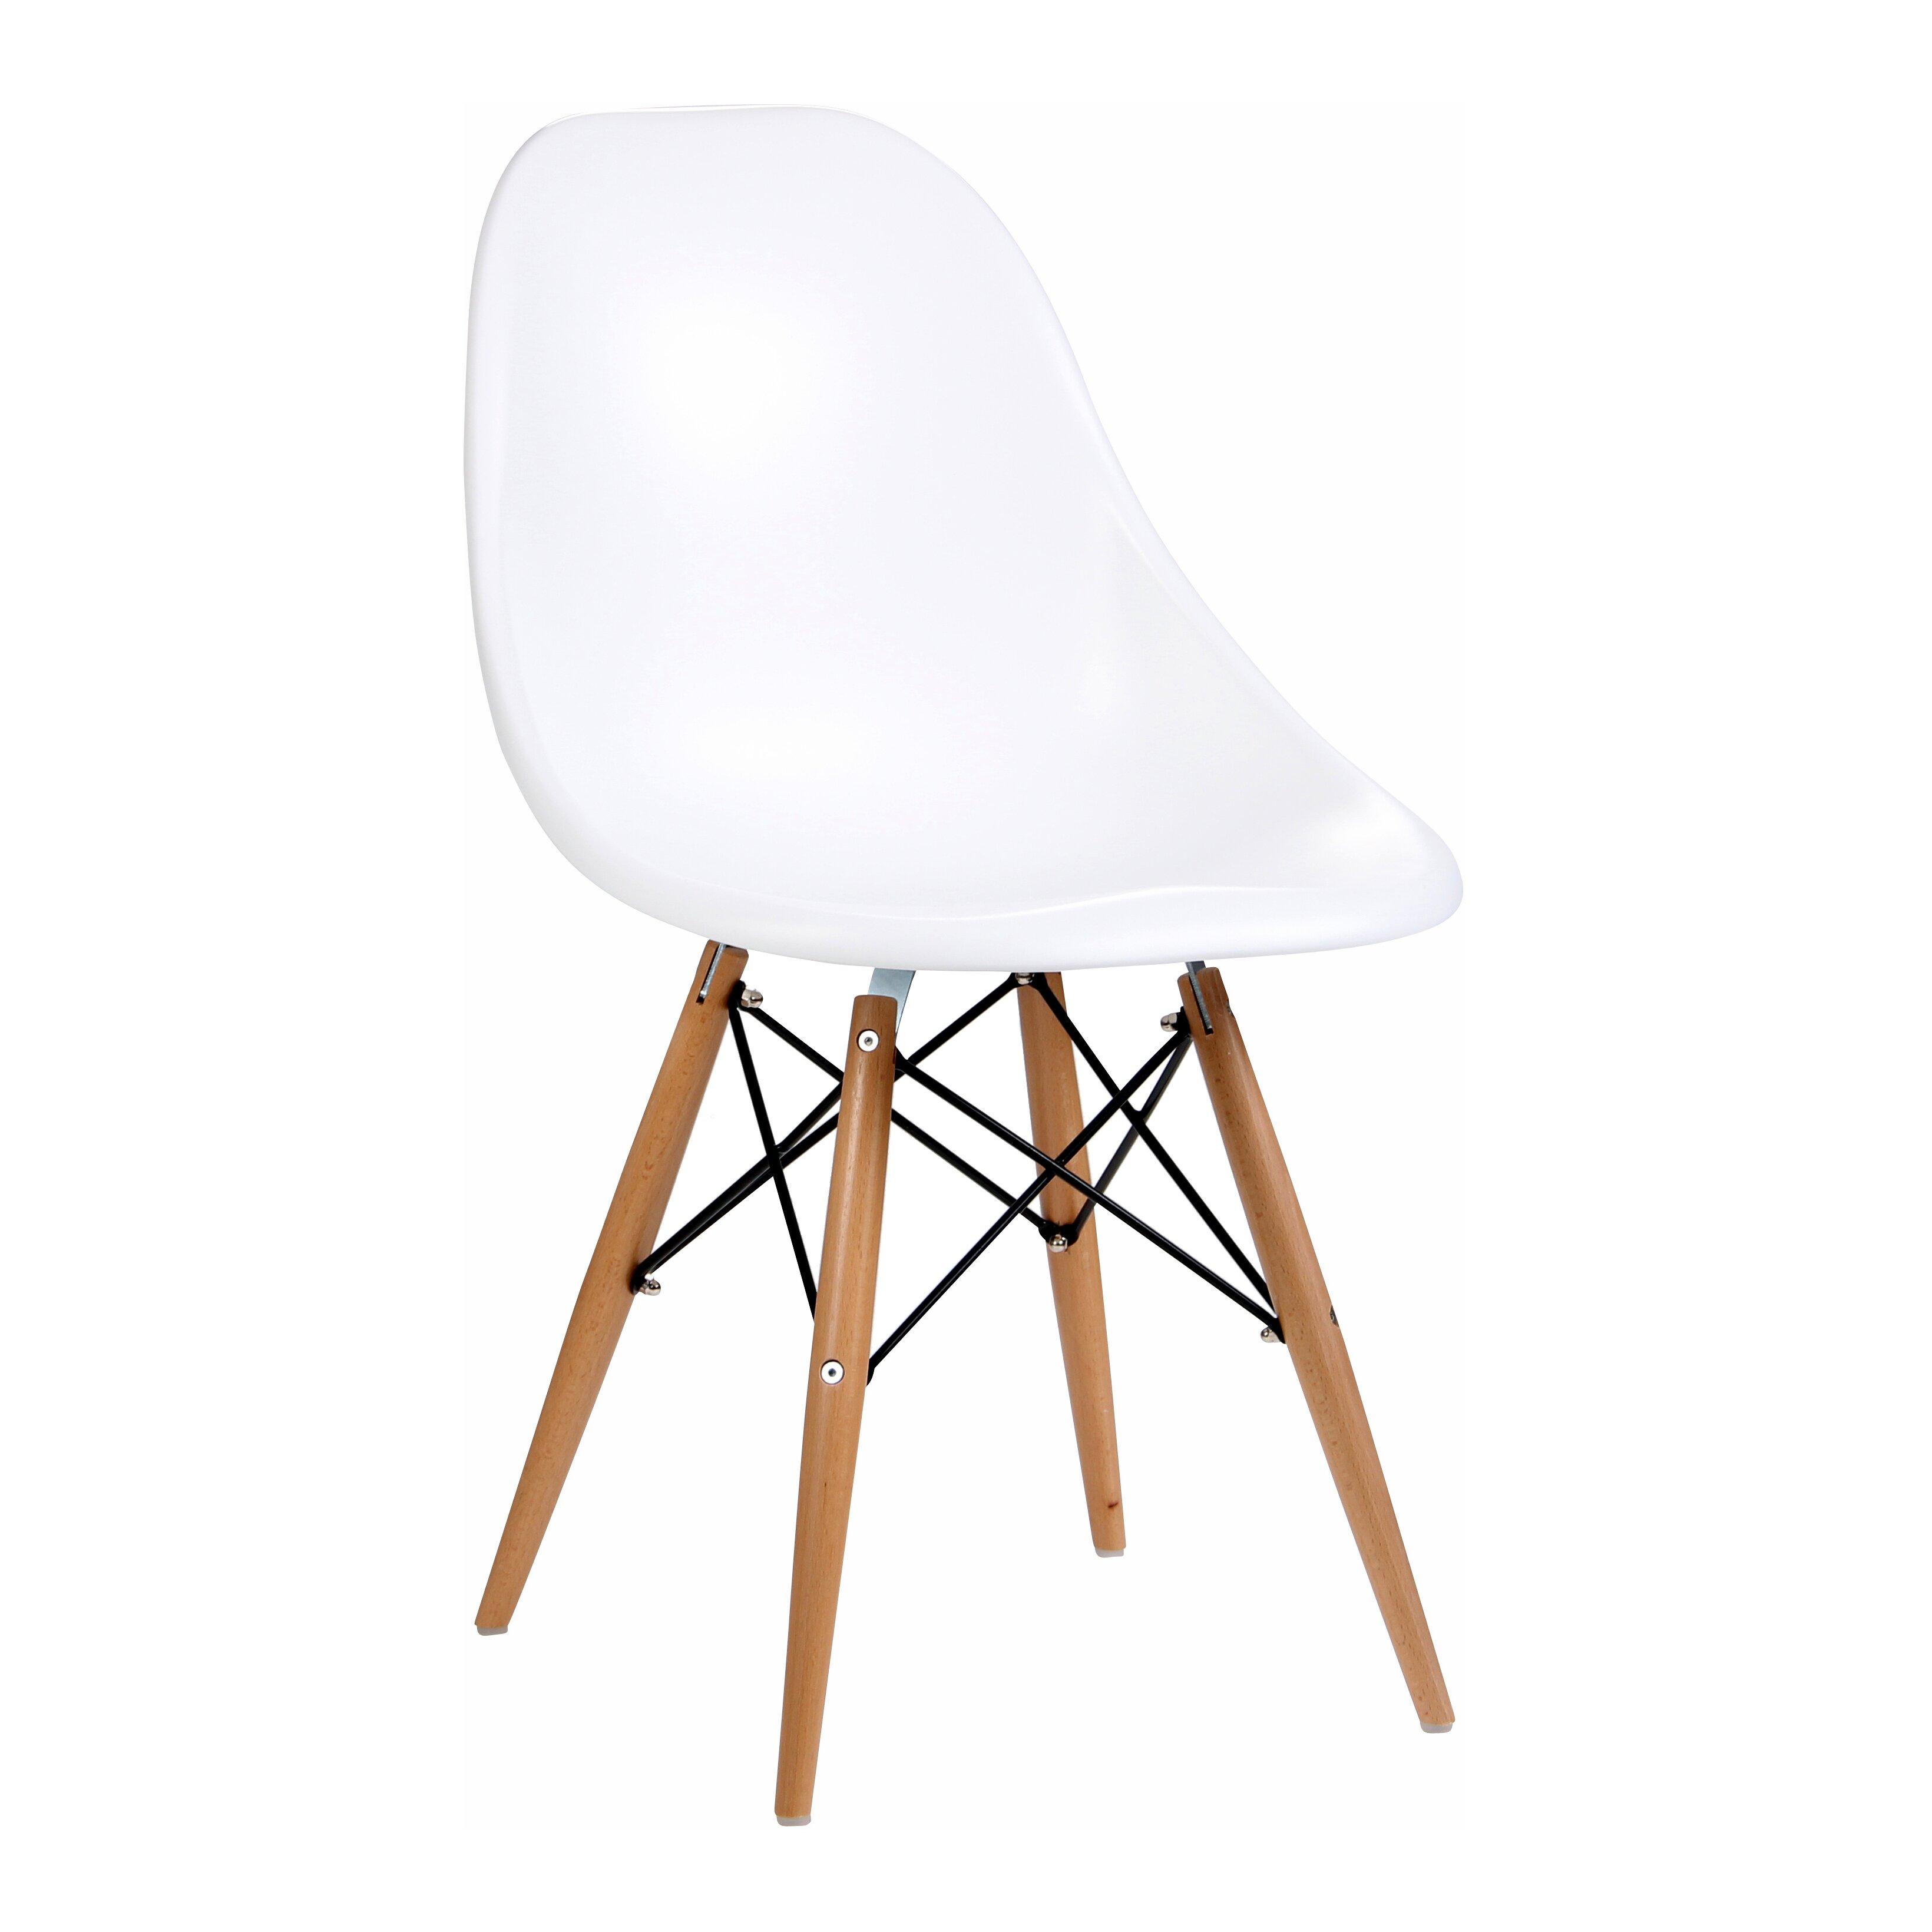 roundhill furniture citytalk side chair reviews wayfair. Black Bedroom Furniture Sets. Home Design Ideas